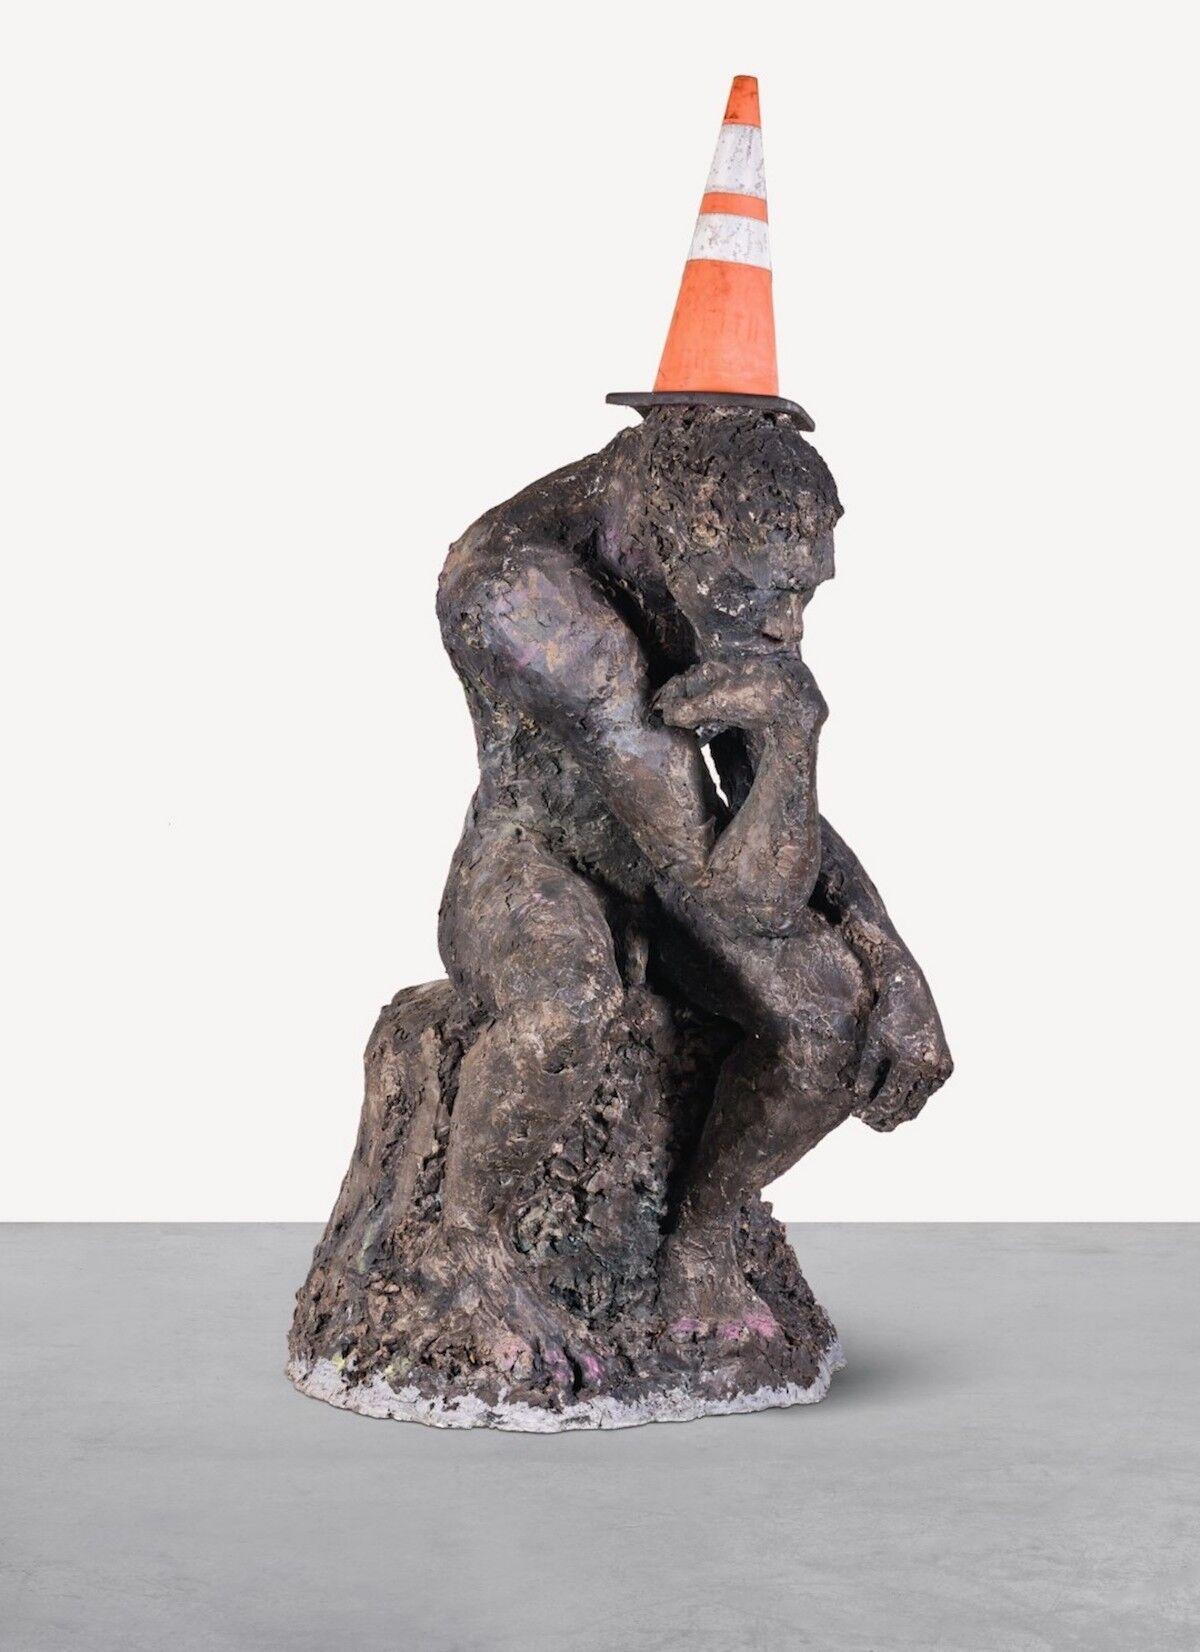 Banksy, The Drinker, 2004. Est. £750,000 to £1 million ($967,000 to $1.2 million). Courtesy Sotheby's.